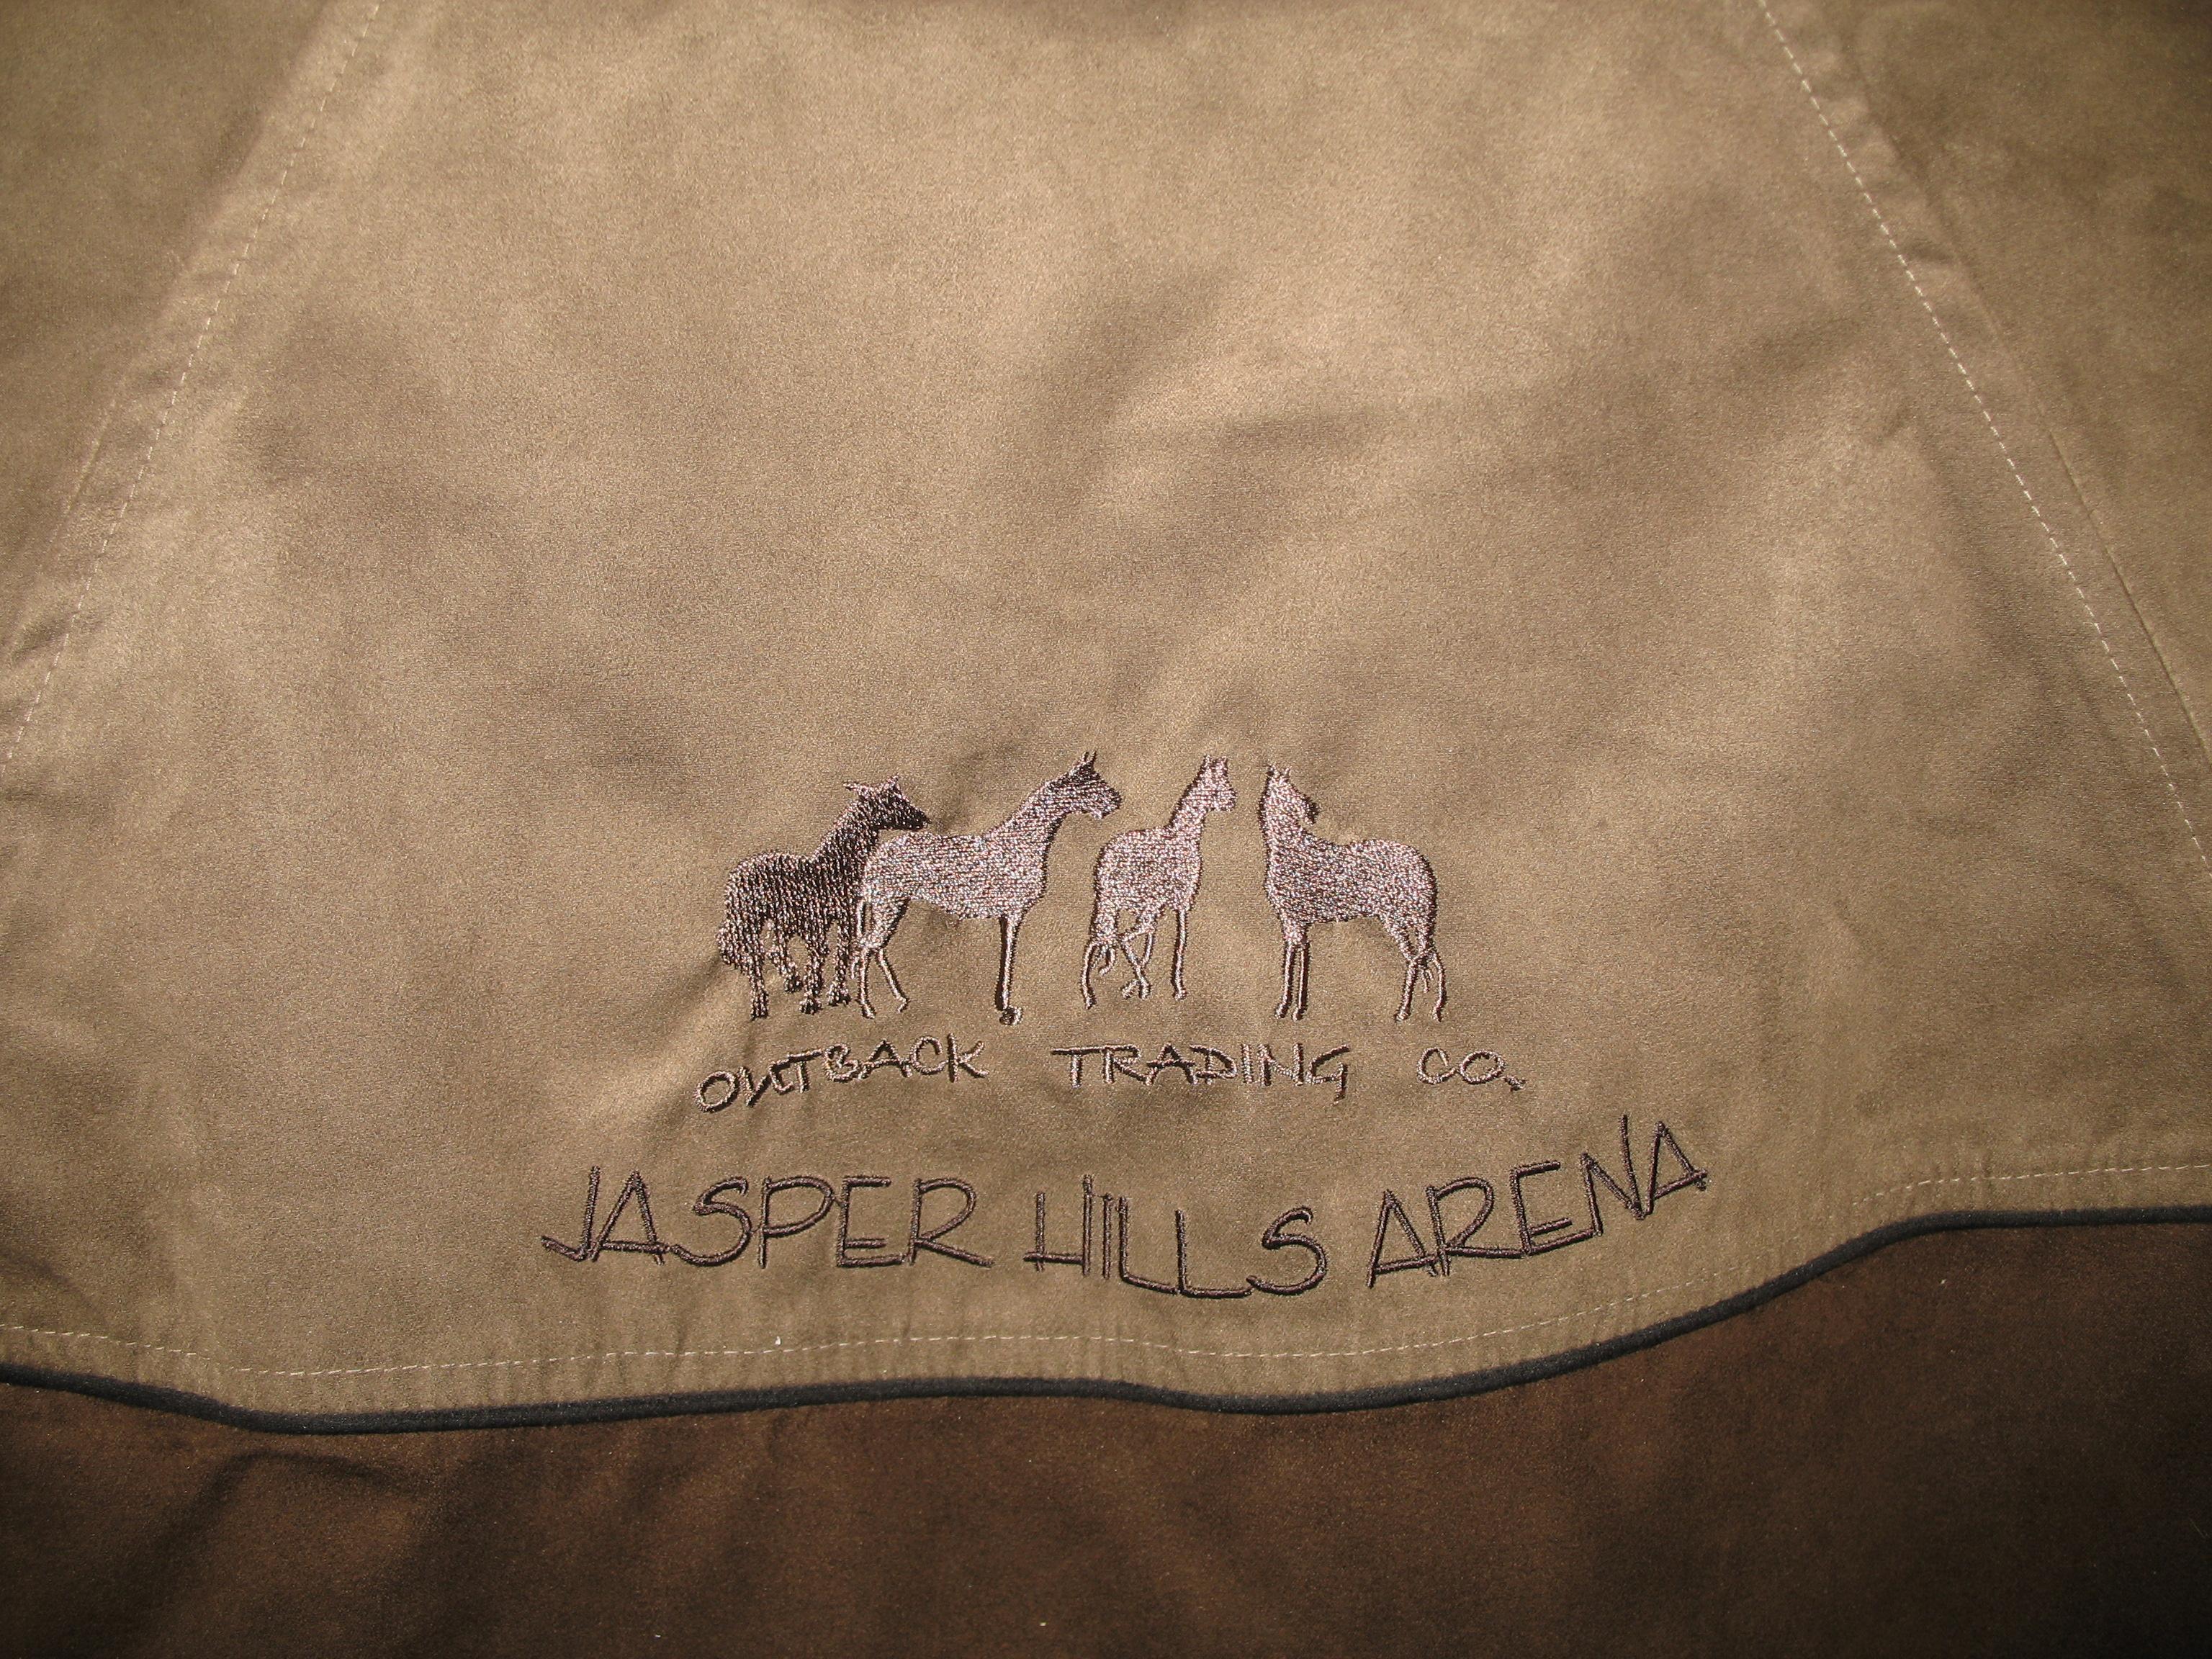 Jasper Hills Arena